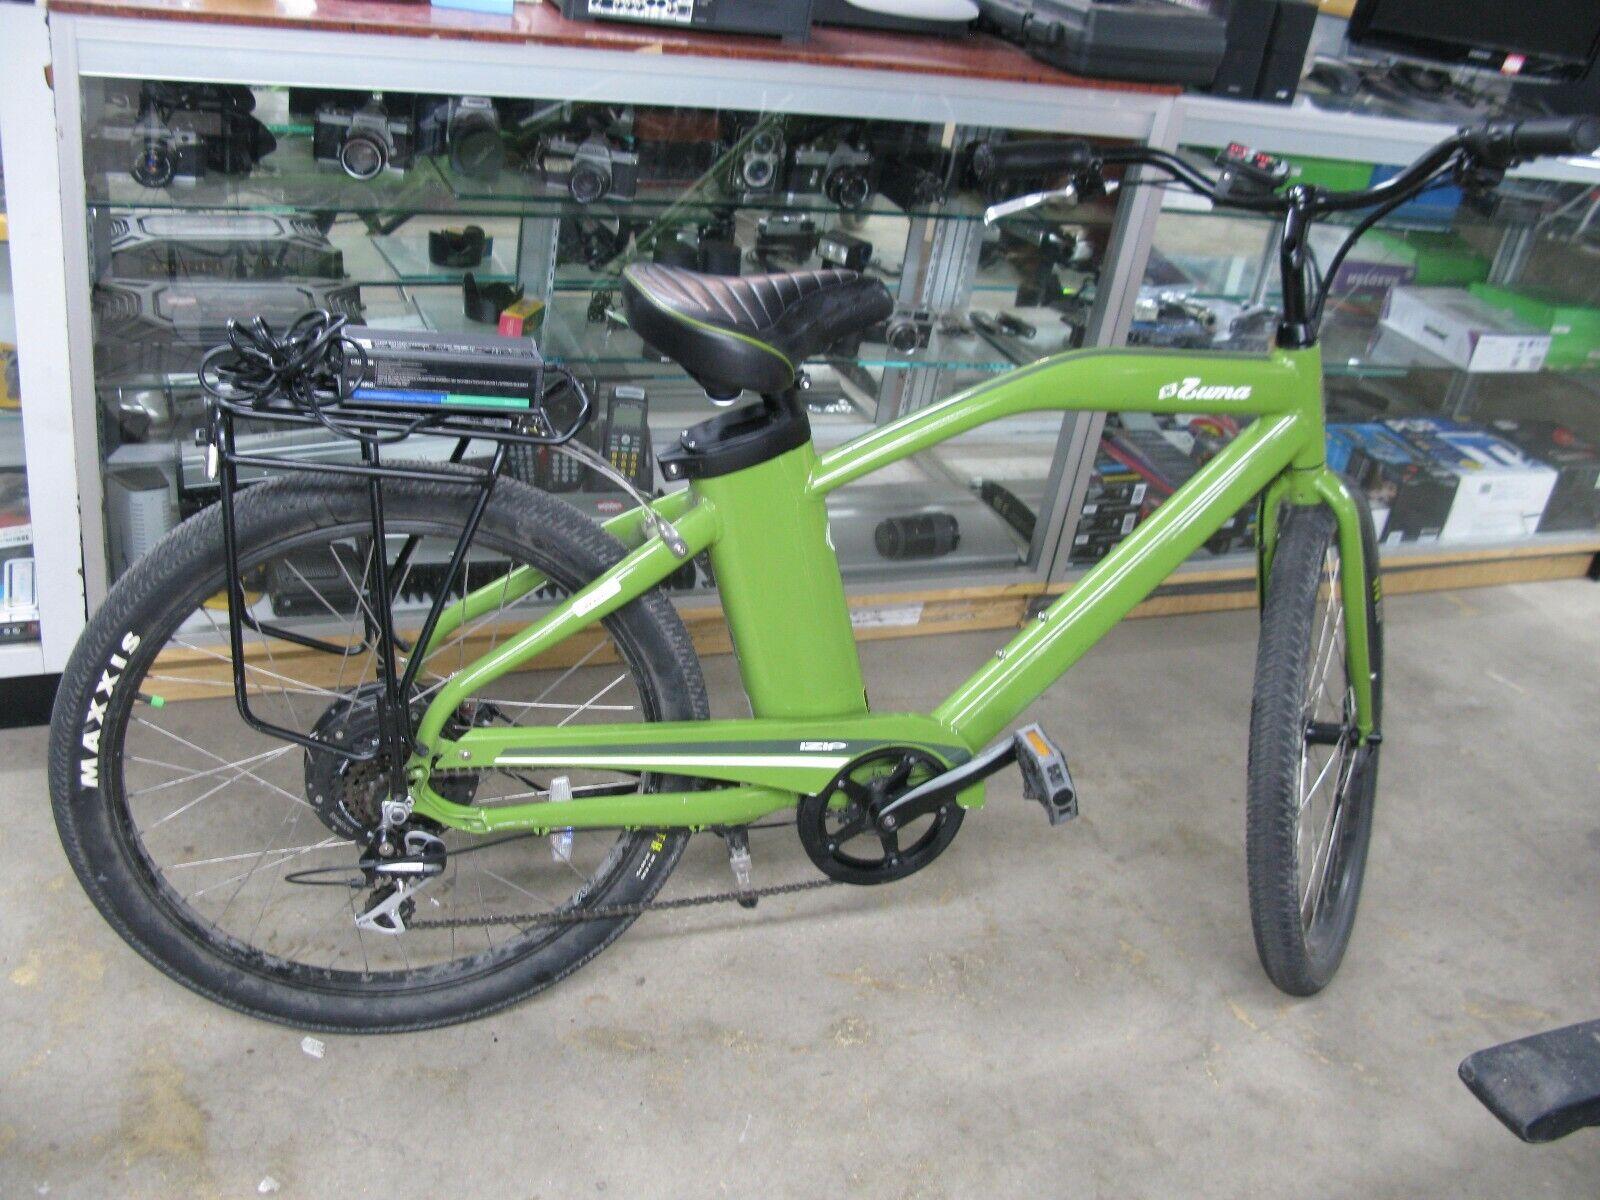 Zuma iZip E3 electric bicycle